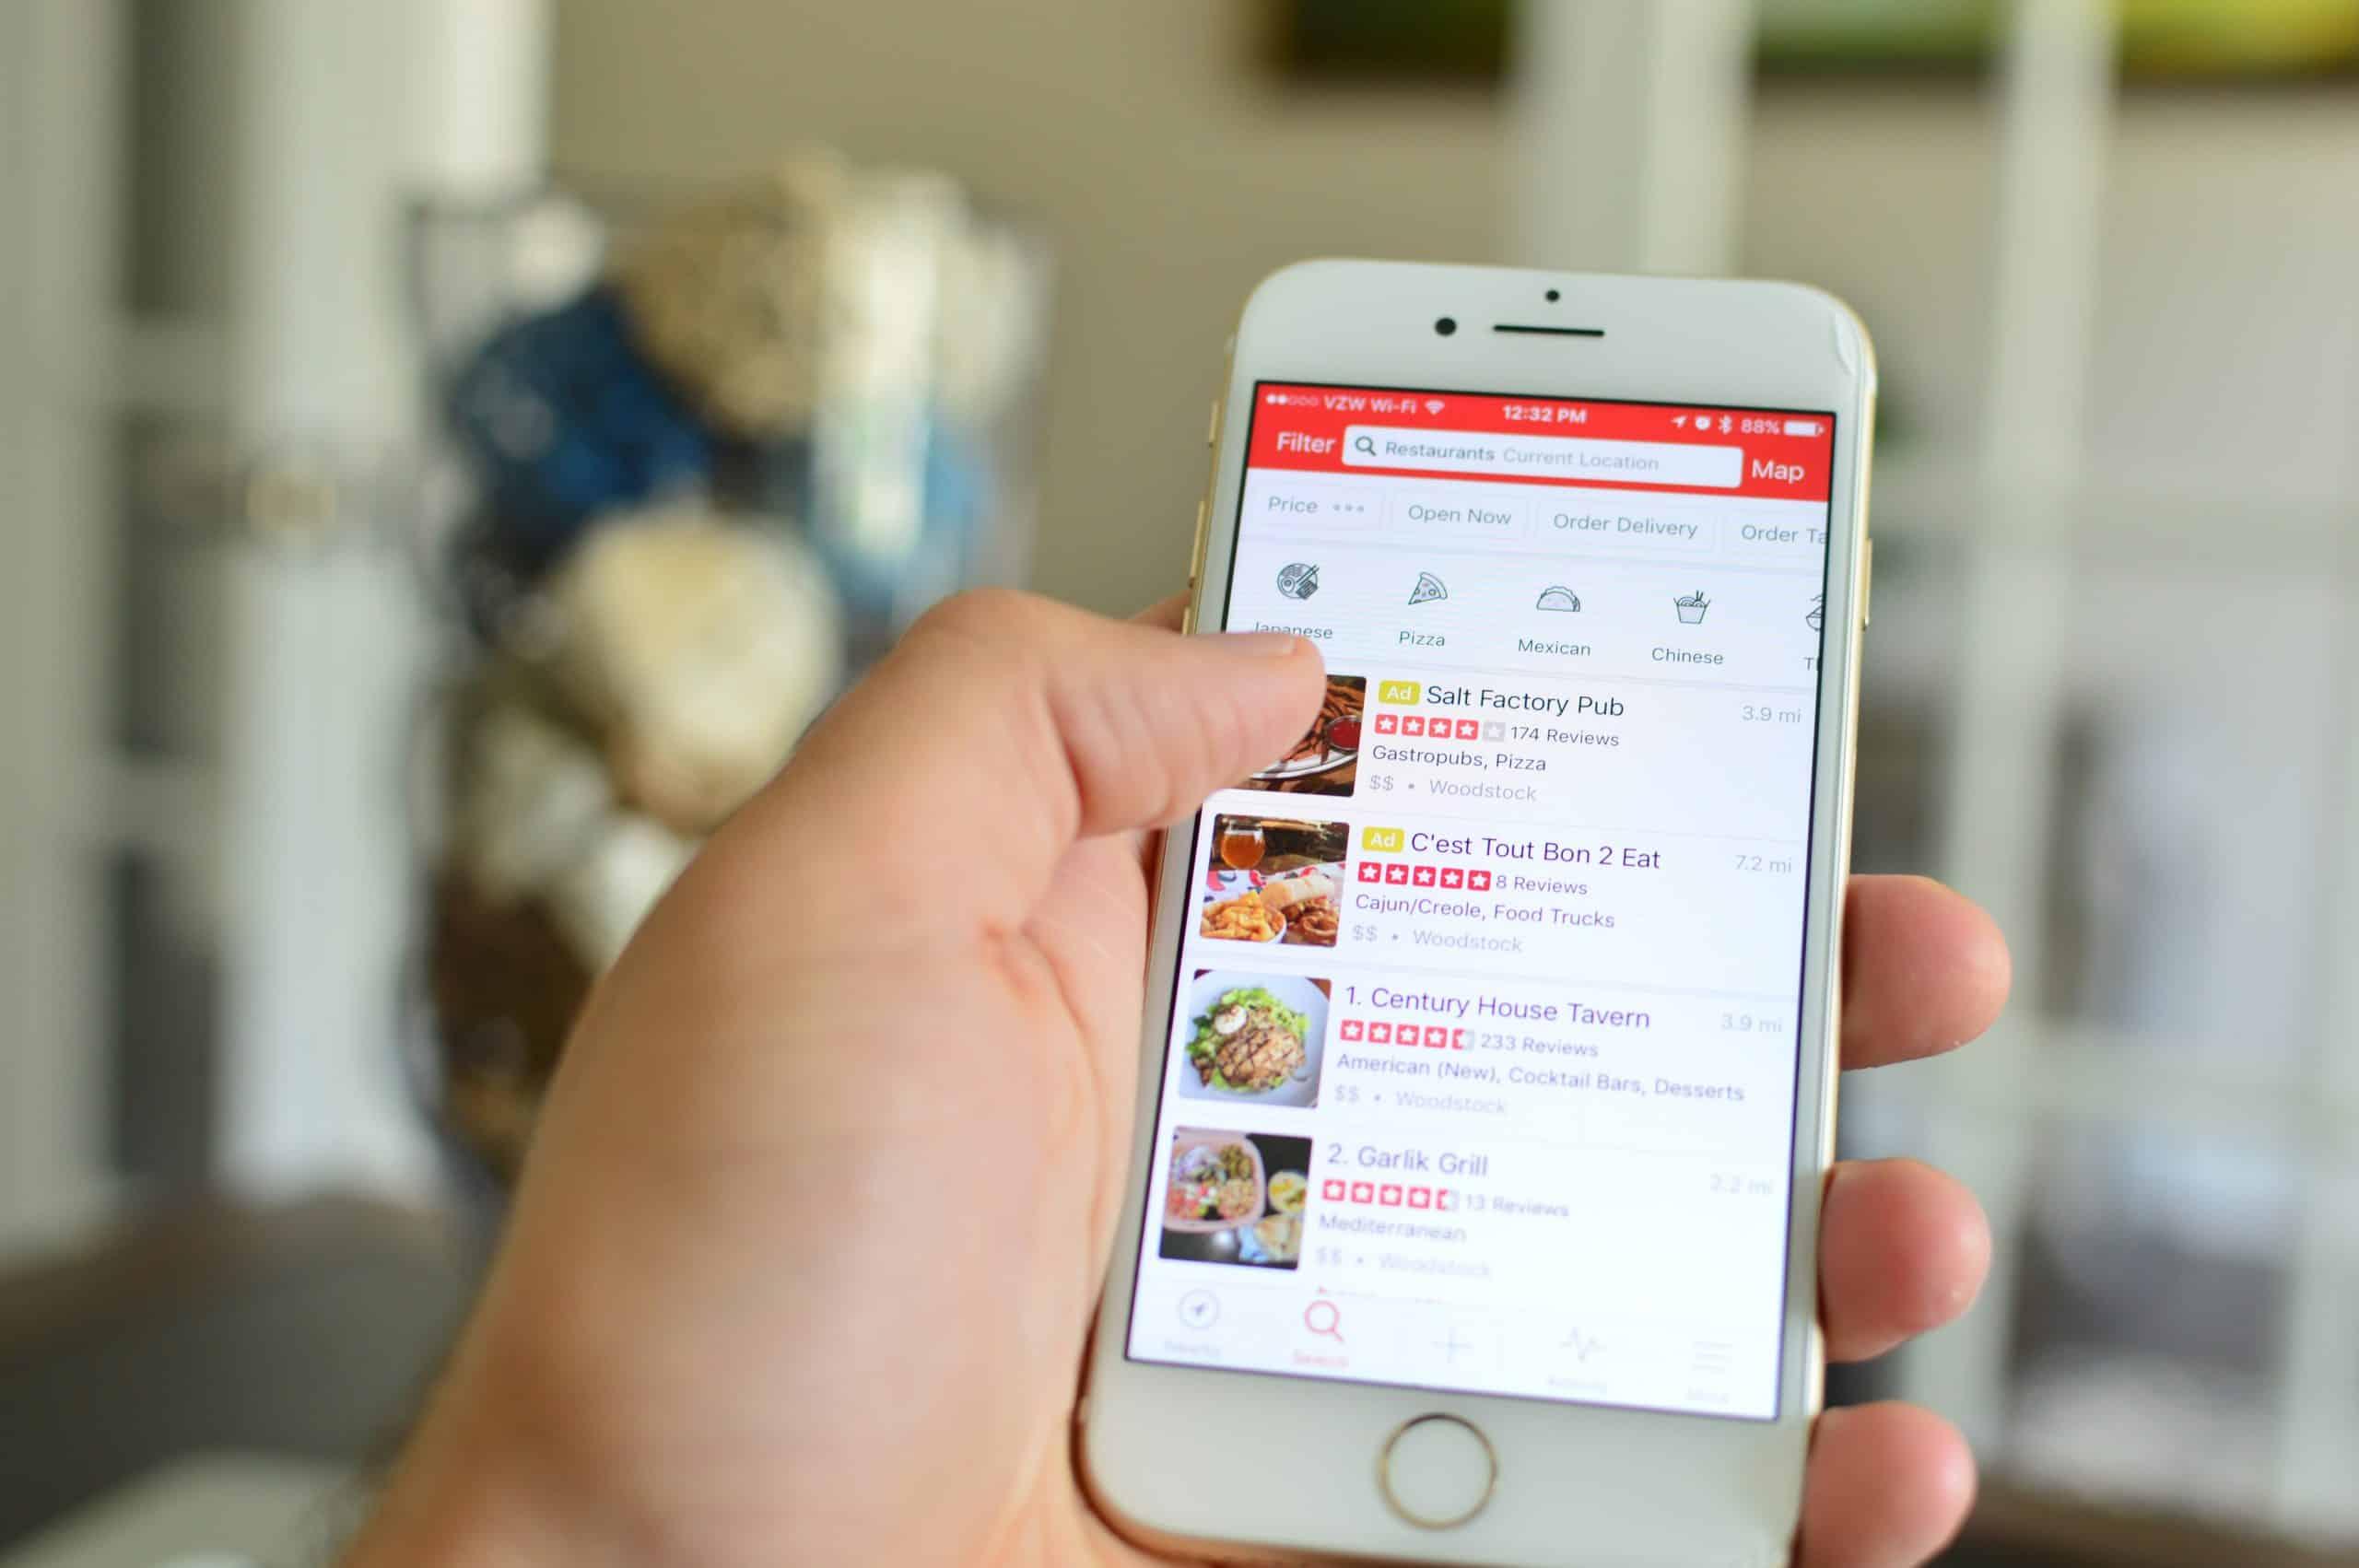 finding-restaurant-using-yelp-app_t20_goKEQ7